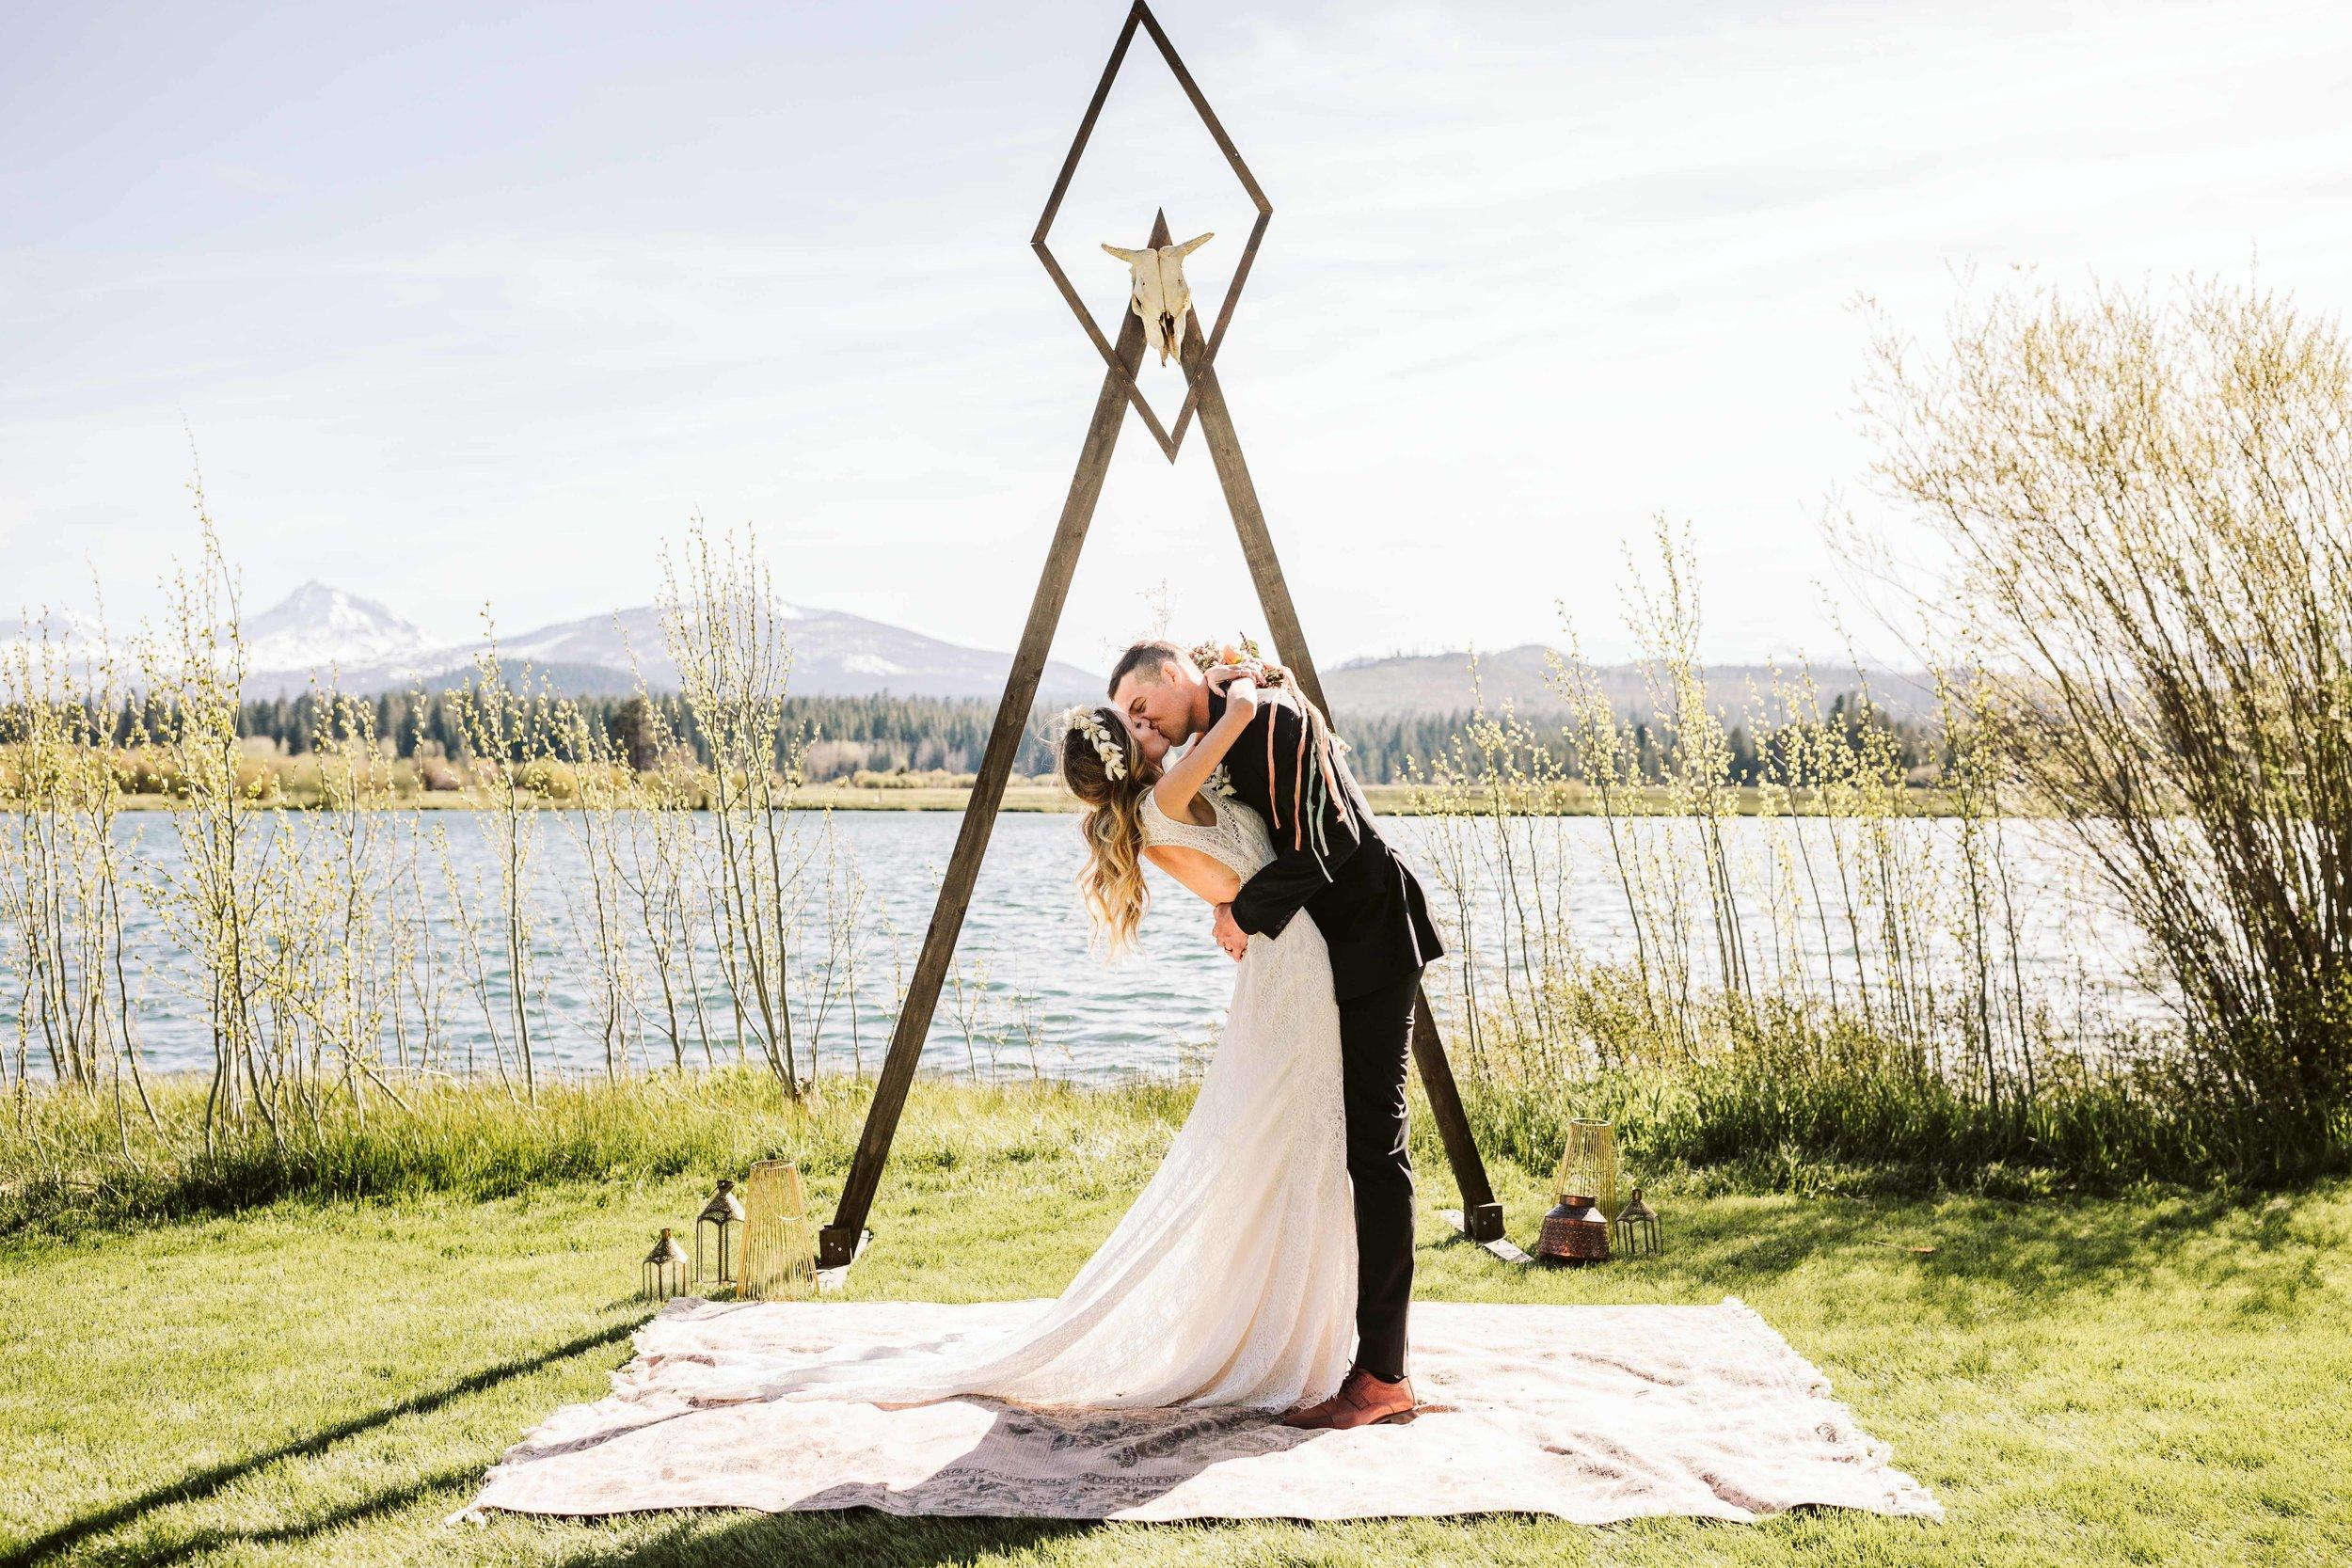 bend-oregon-wedding-photographer-53.jpg